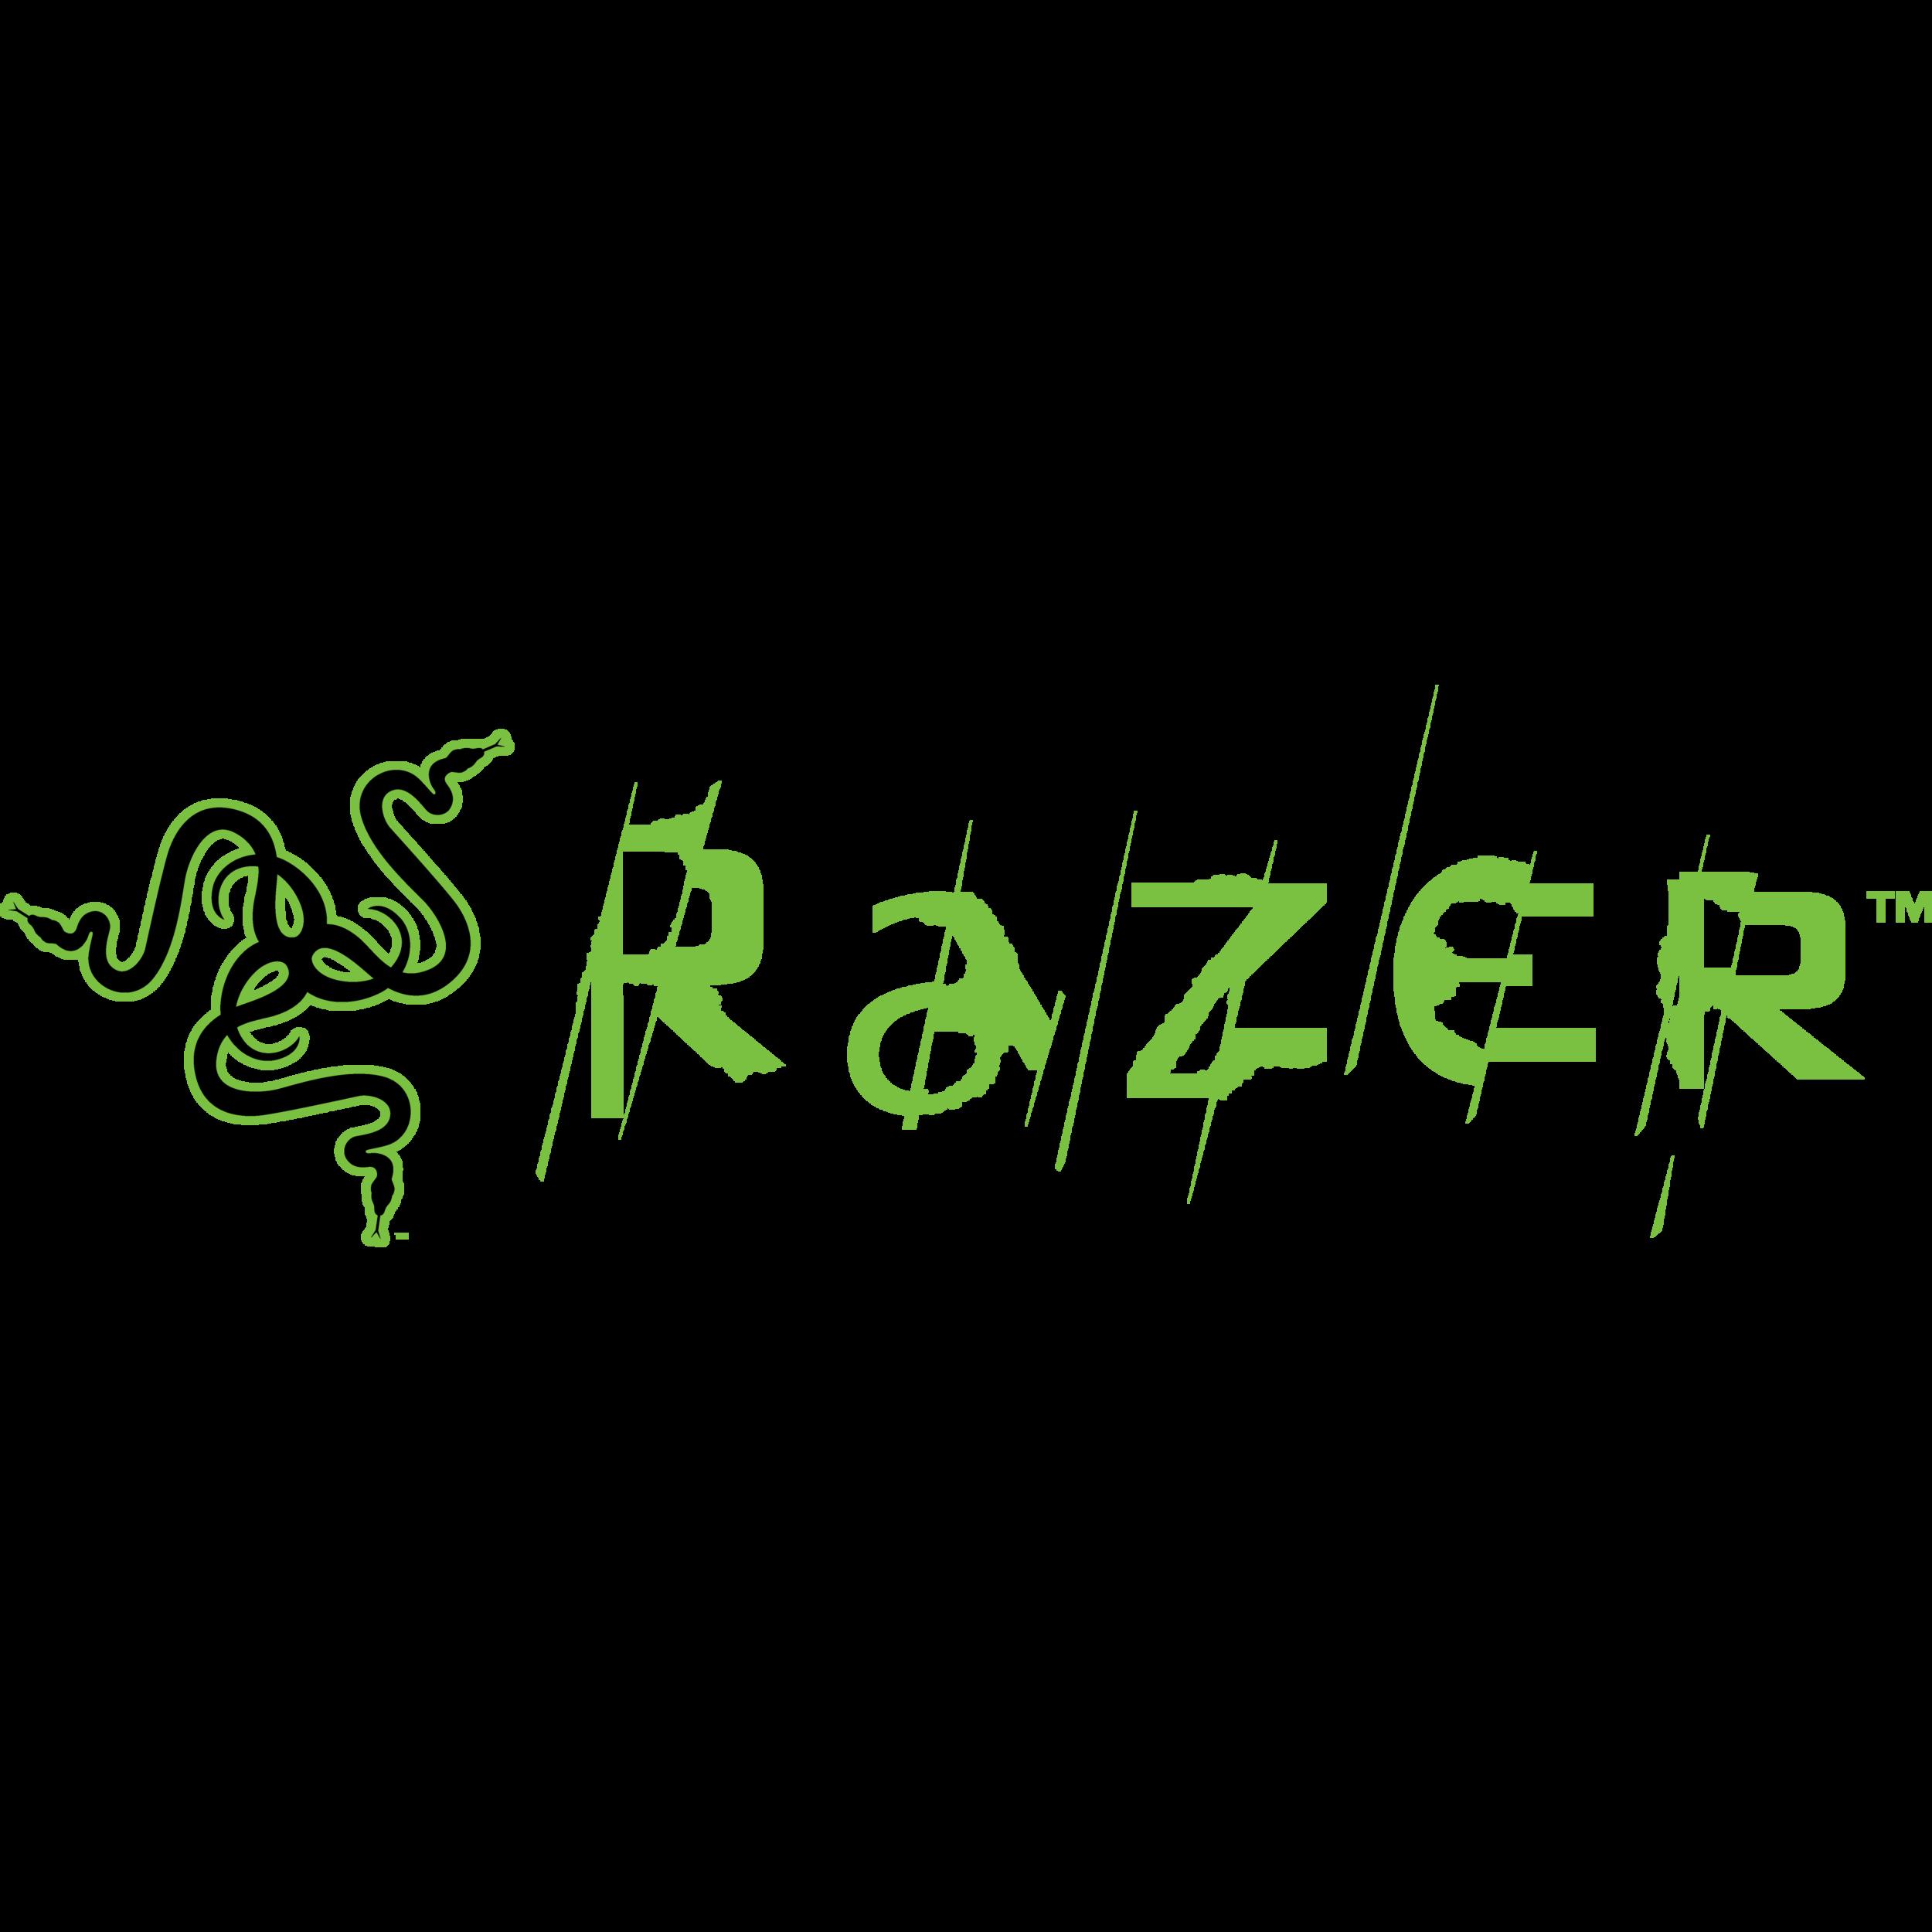 Razer-Logo-Transparent-Background.png